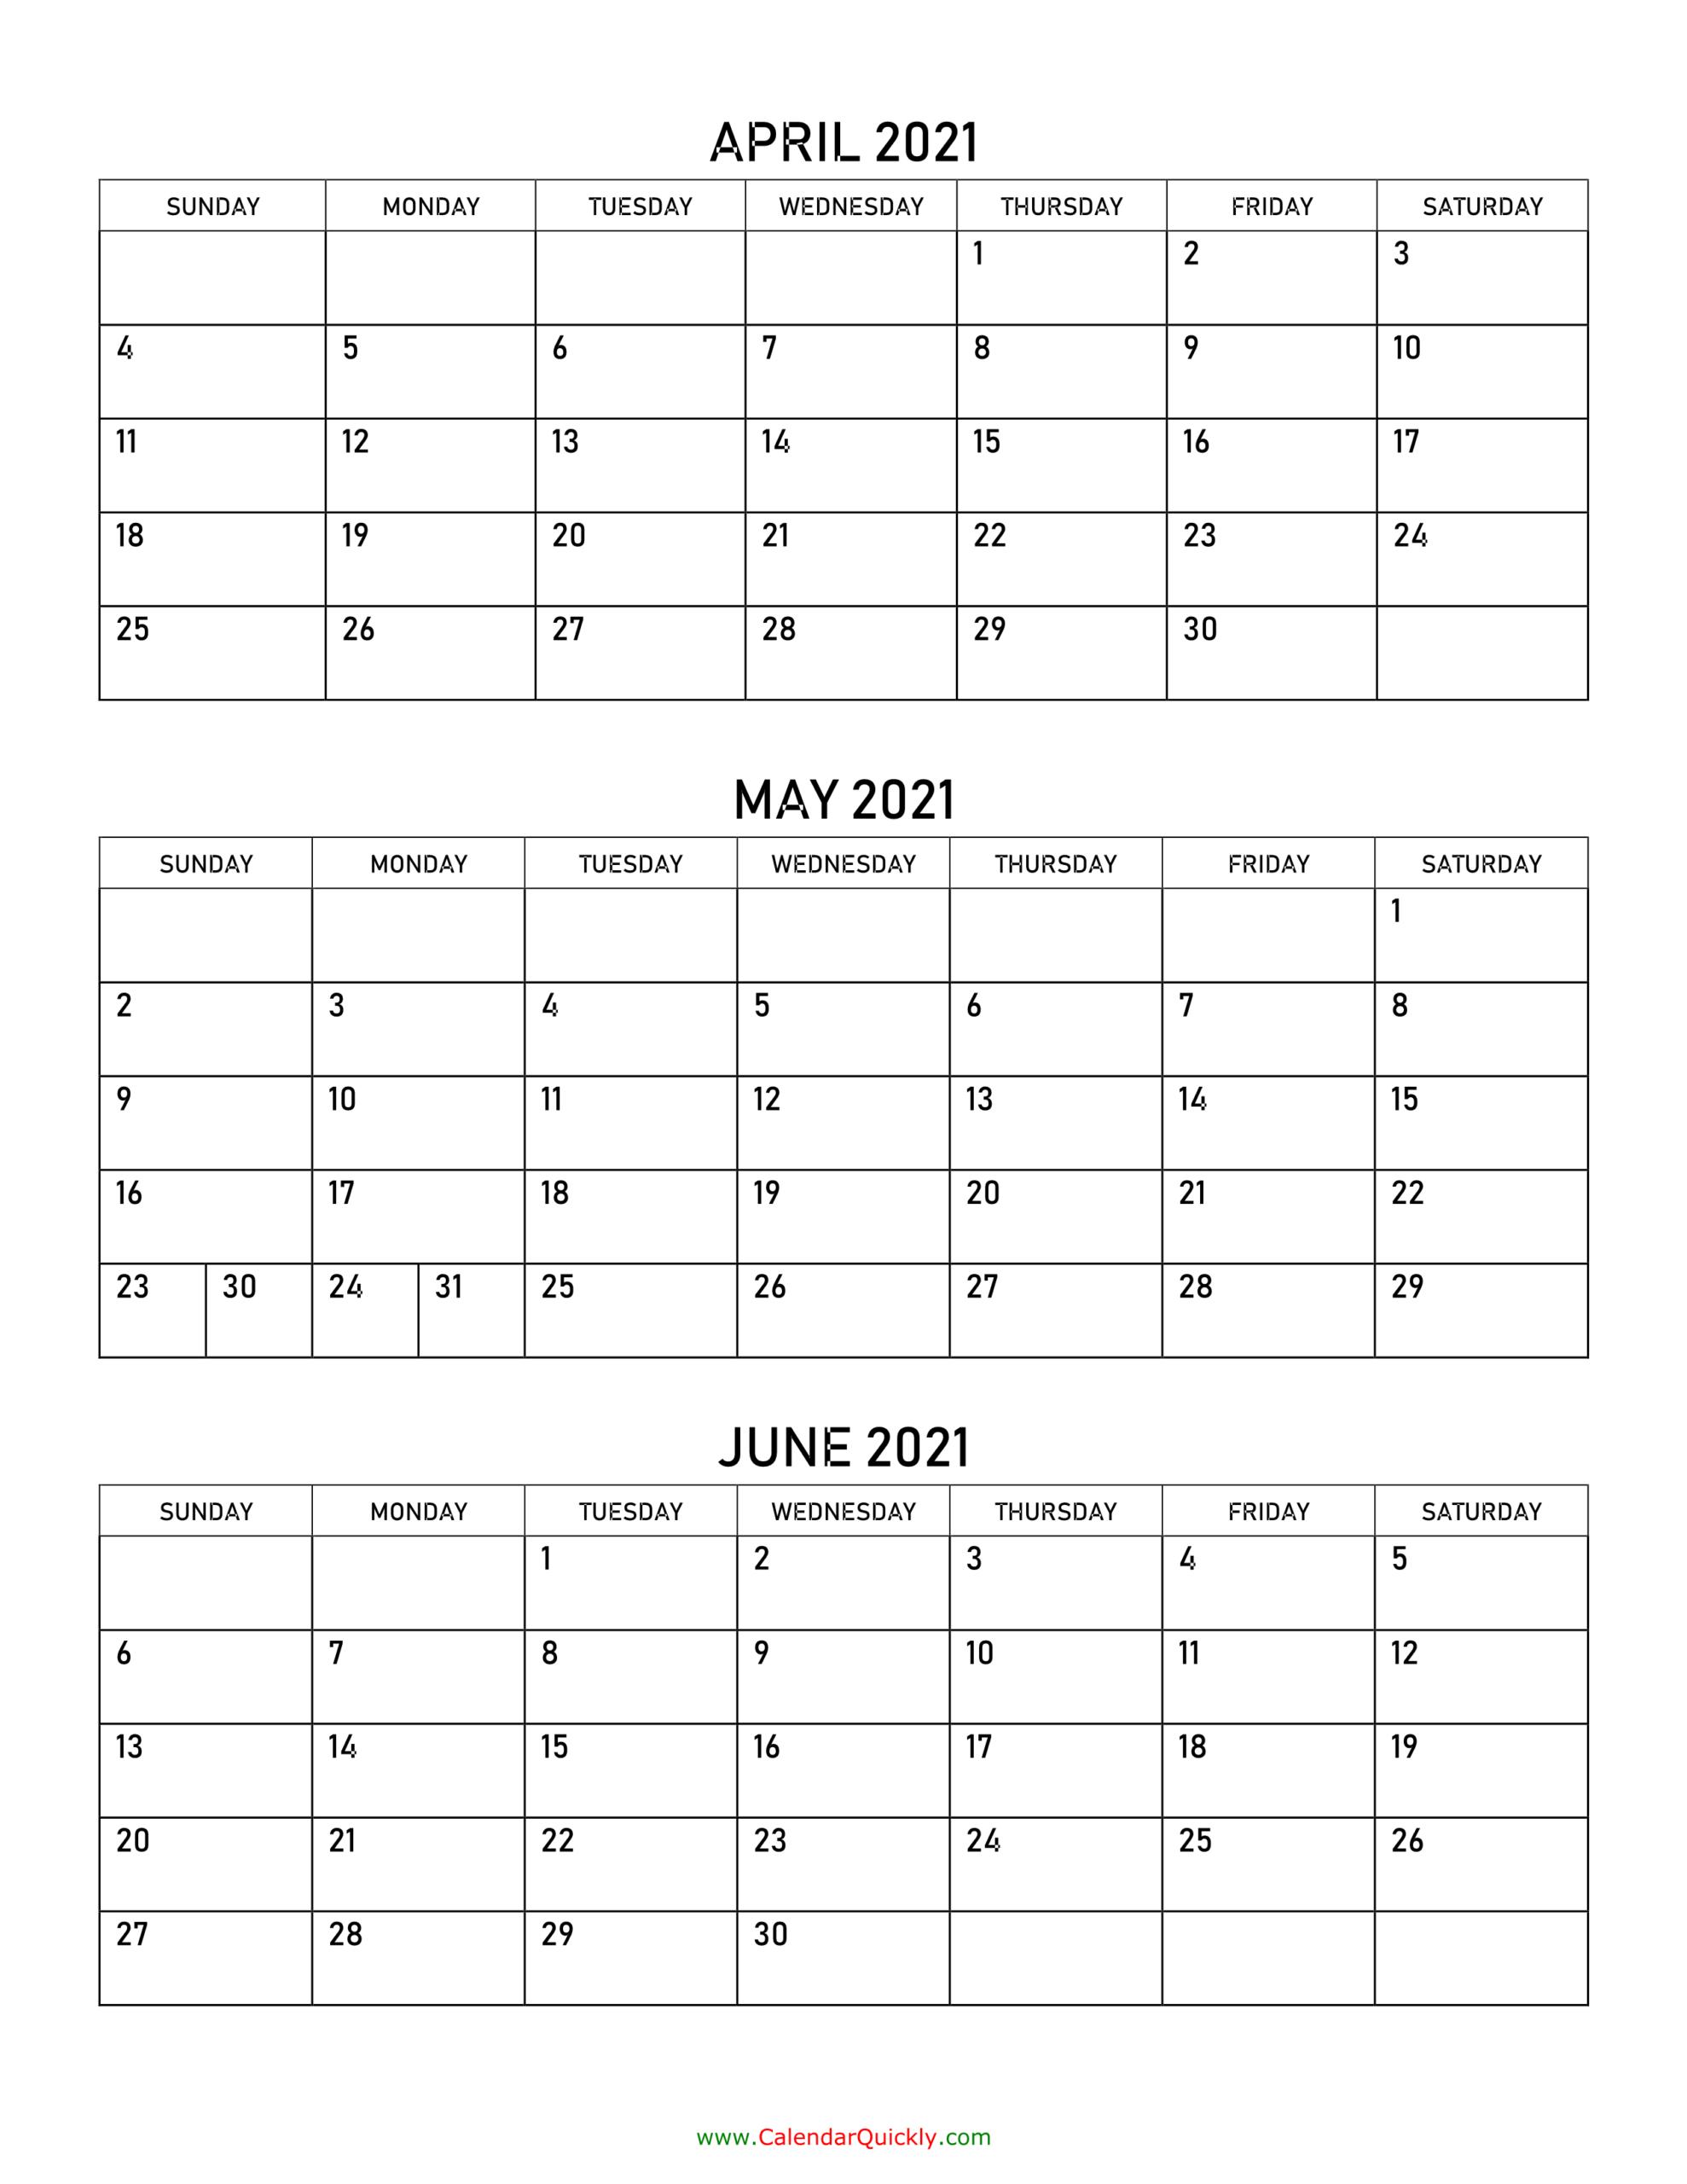 April To June 2021 Calendar | Calendar Quickly regarding Printable Calendar With Three Months